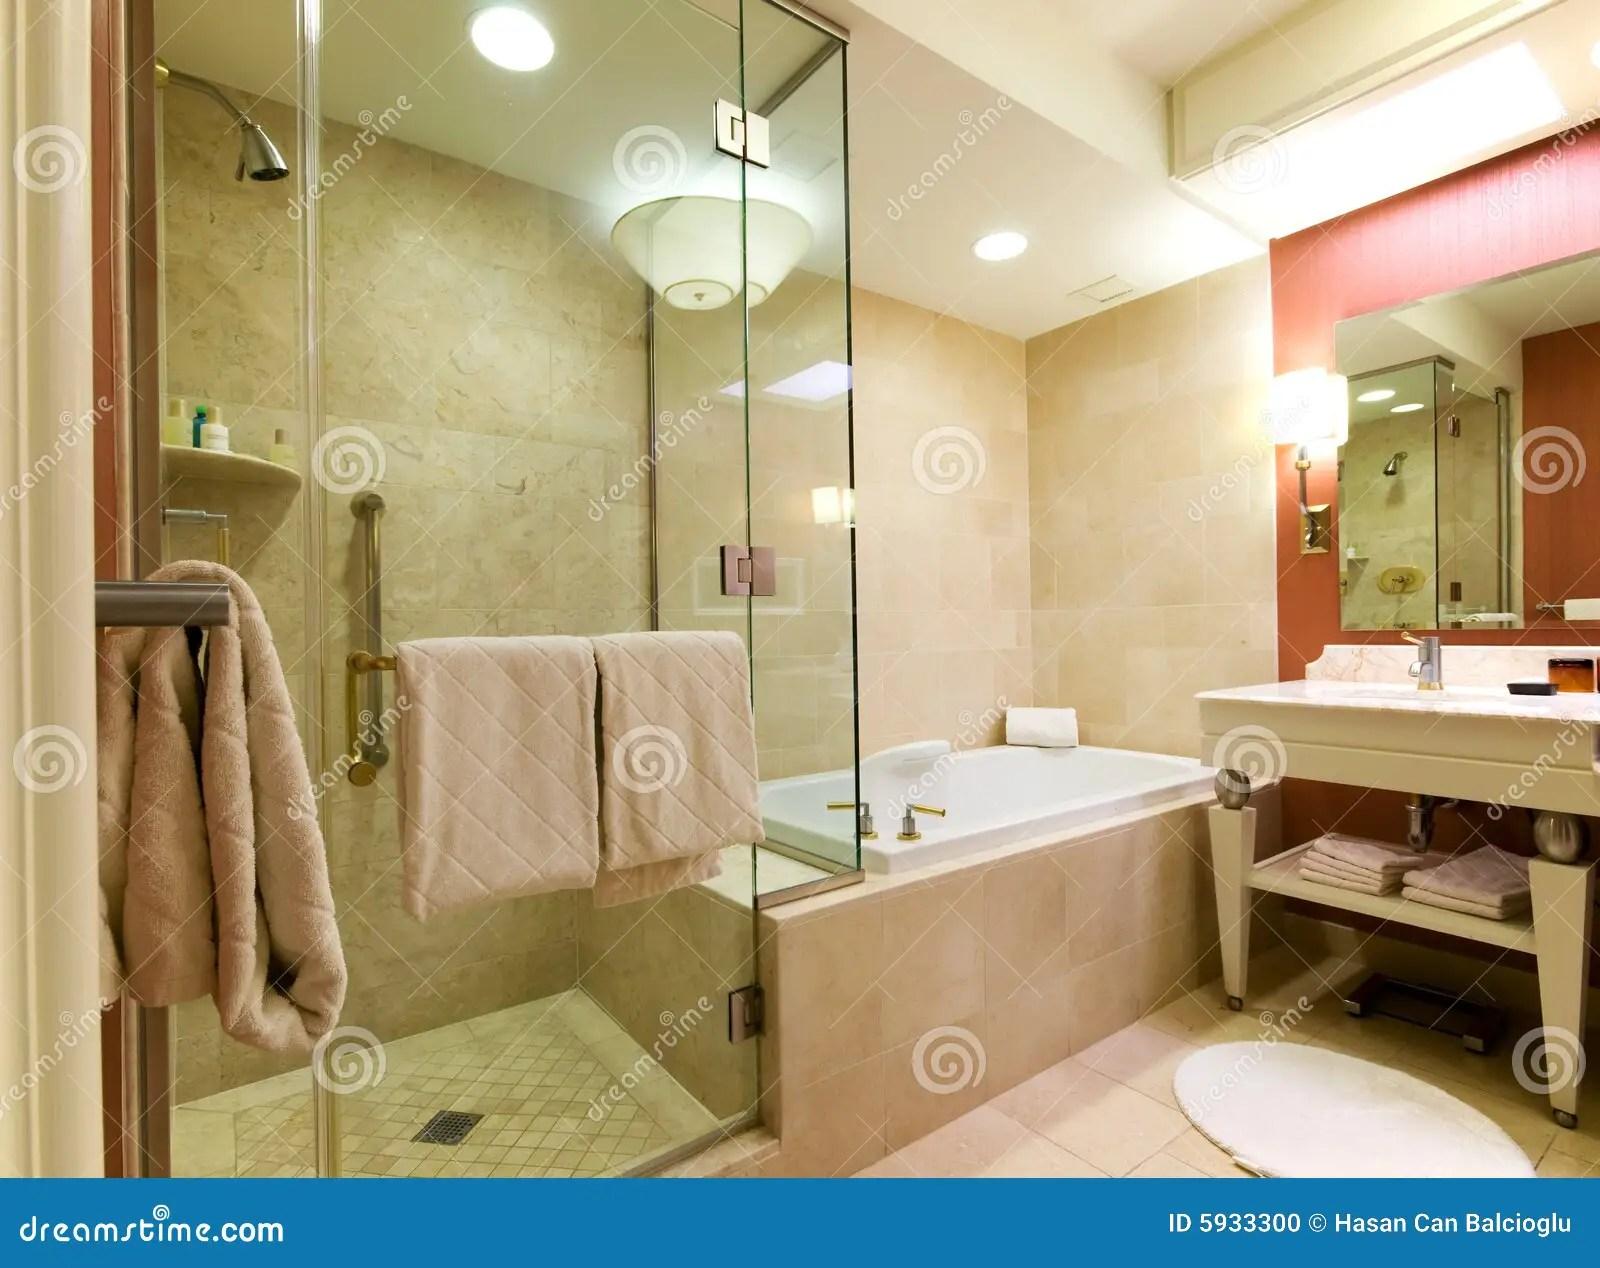 Luxury Hotel Bathroom Stock Photo Image Of Bathtub High